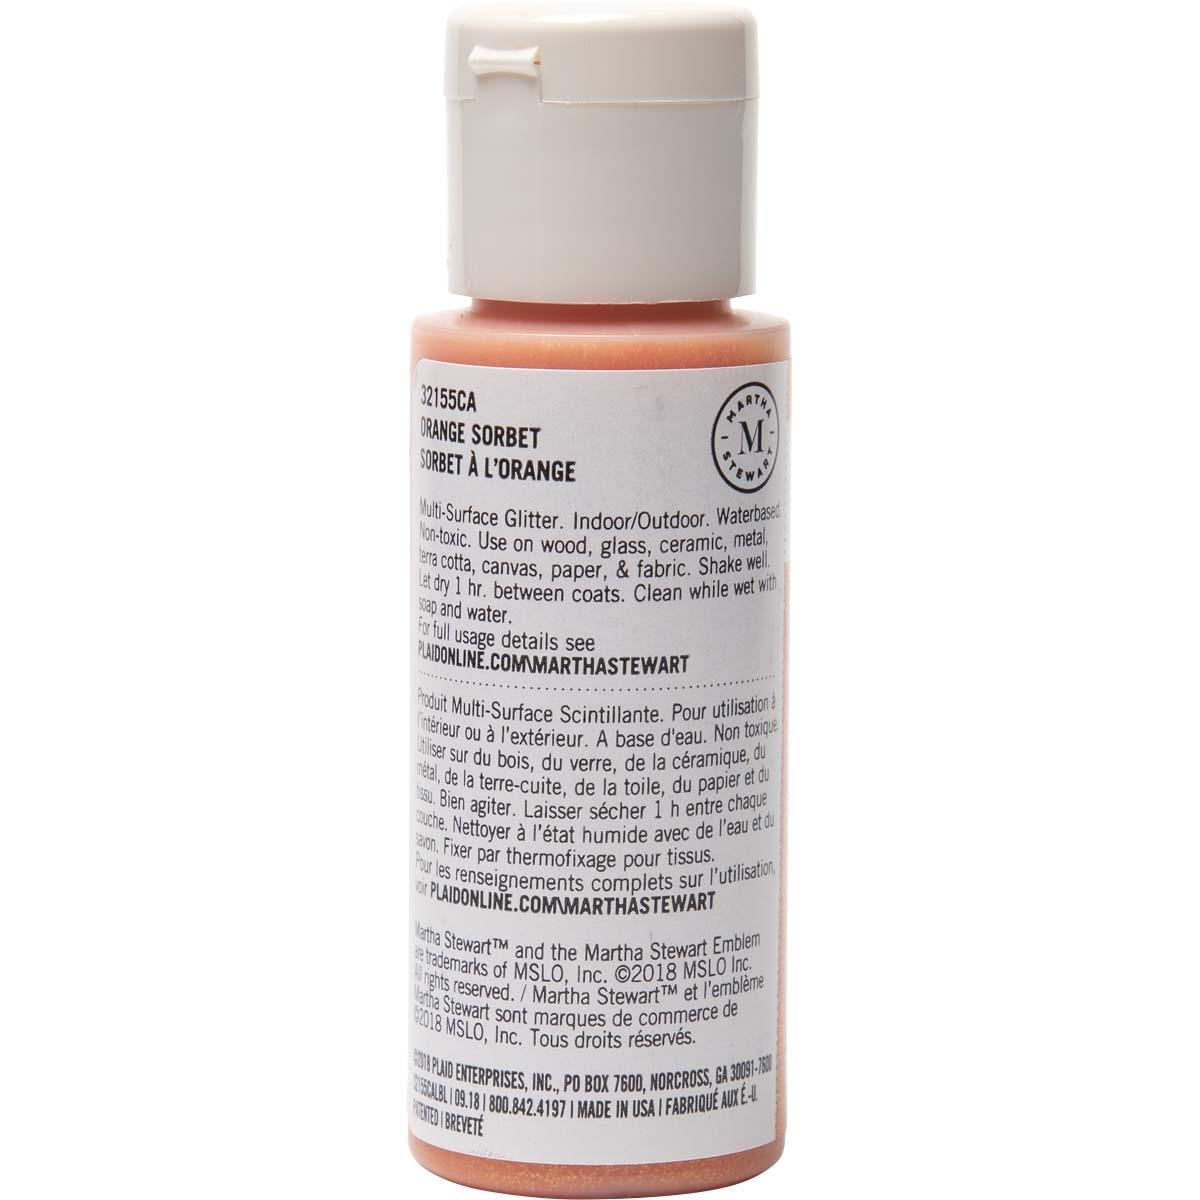 Martha Stewart ® Multi-Surface Glitter Acrylic Craft Paint - Orange Sorbet, 2 oz. - 32155CA